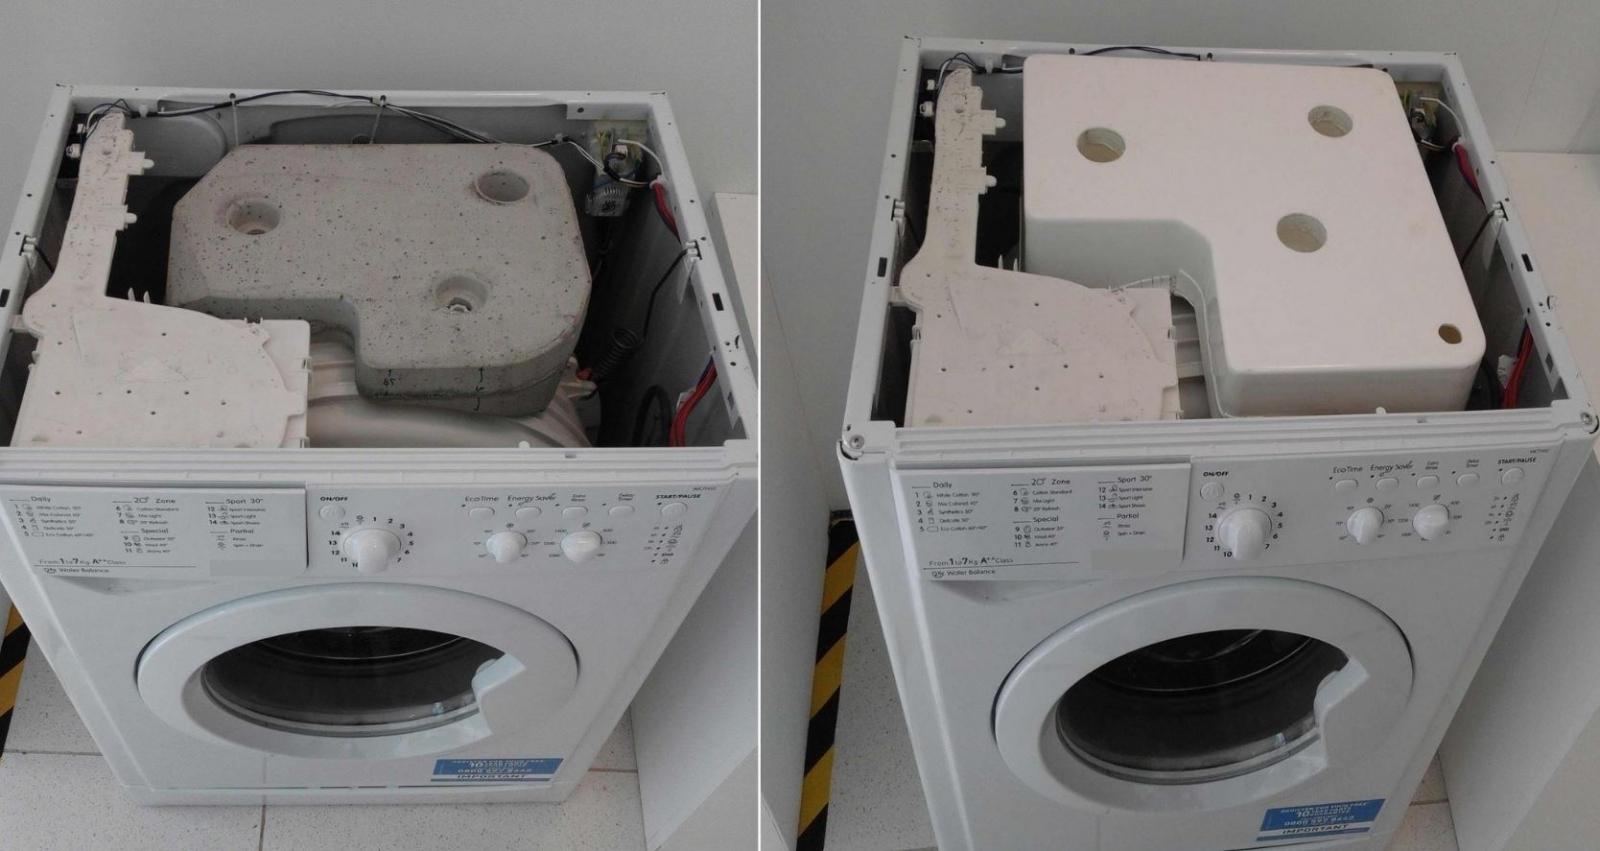 Washing machine invention environment